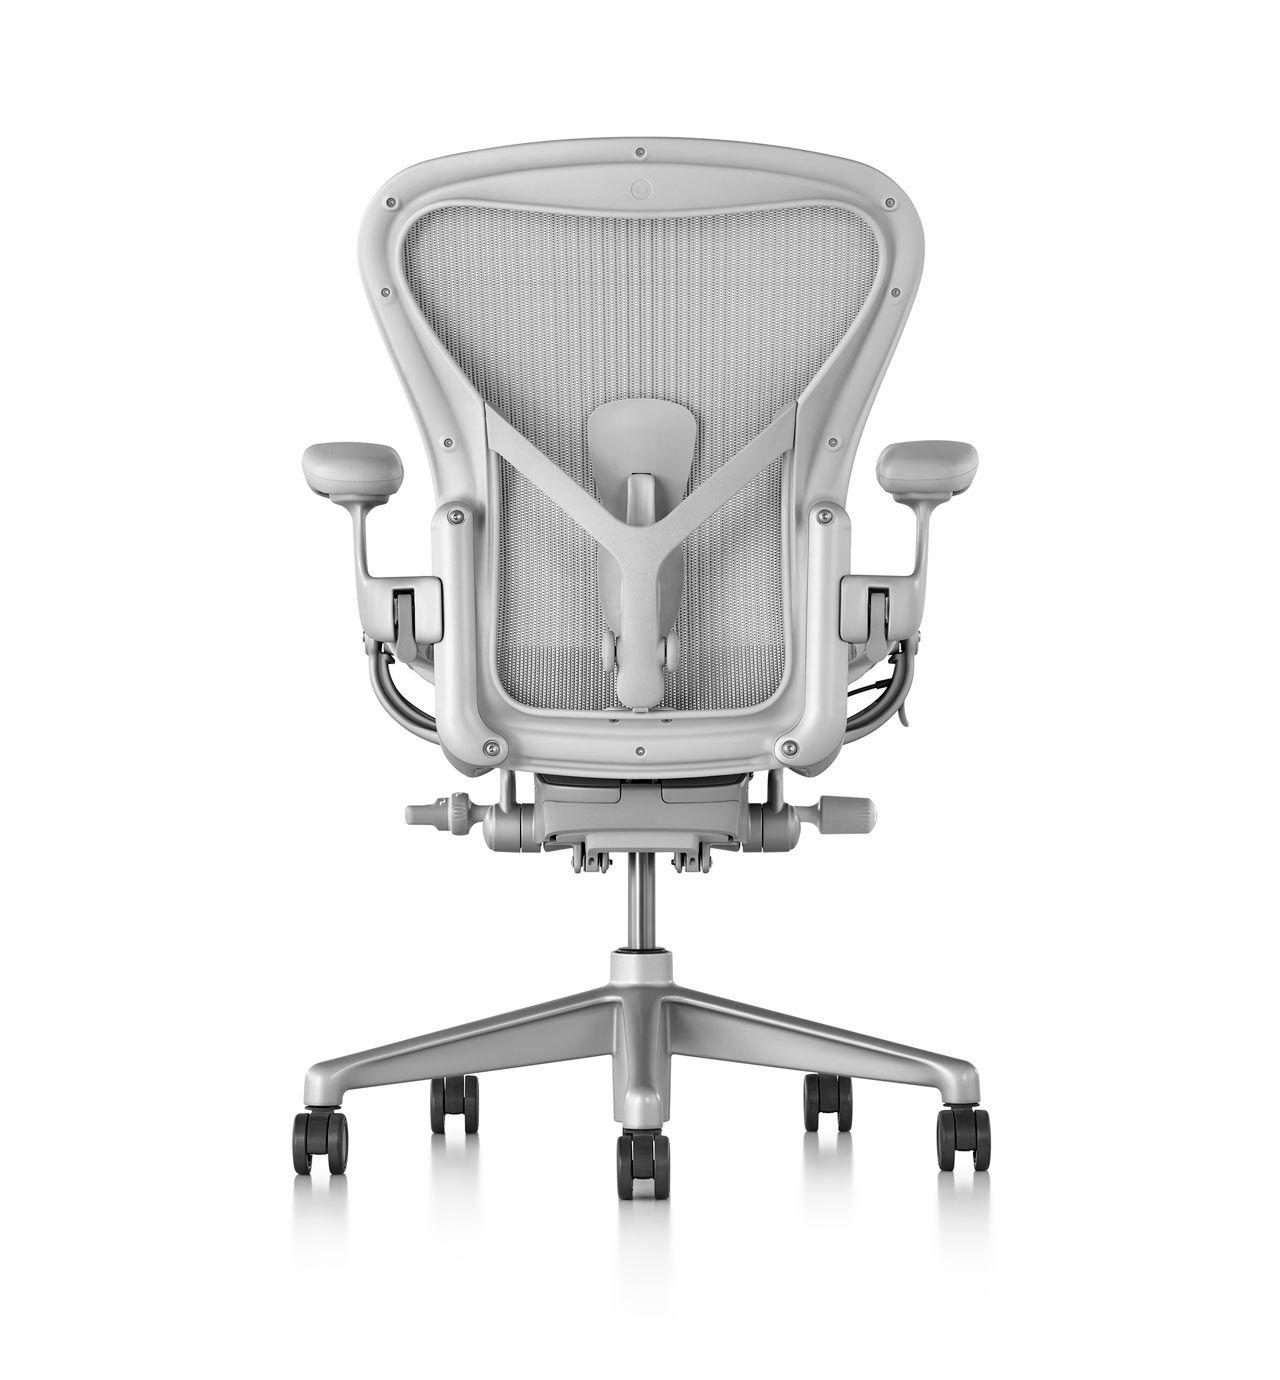 Herman Miller's Aeron® Chair Gets Remastered Work chair